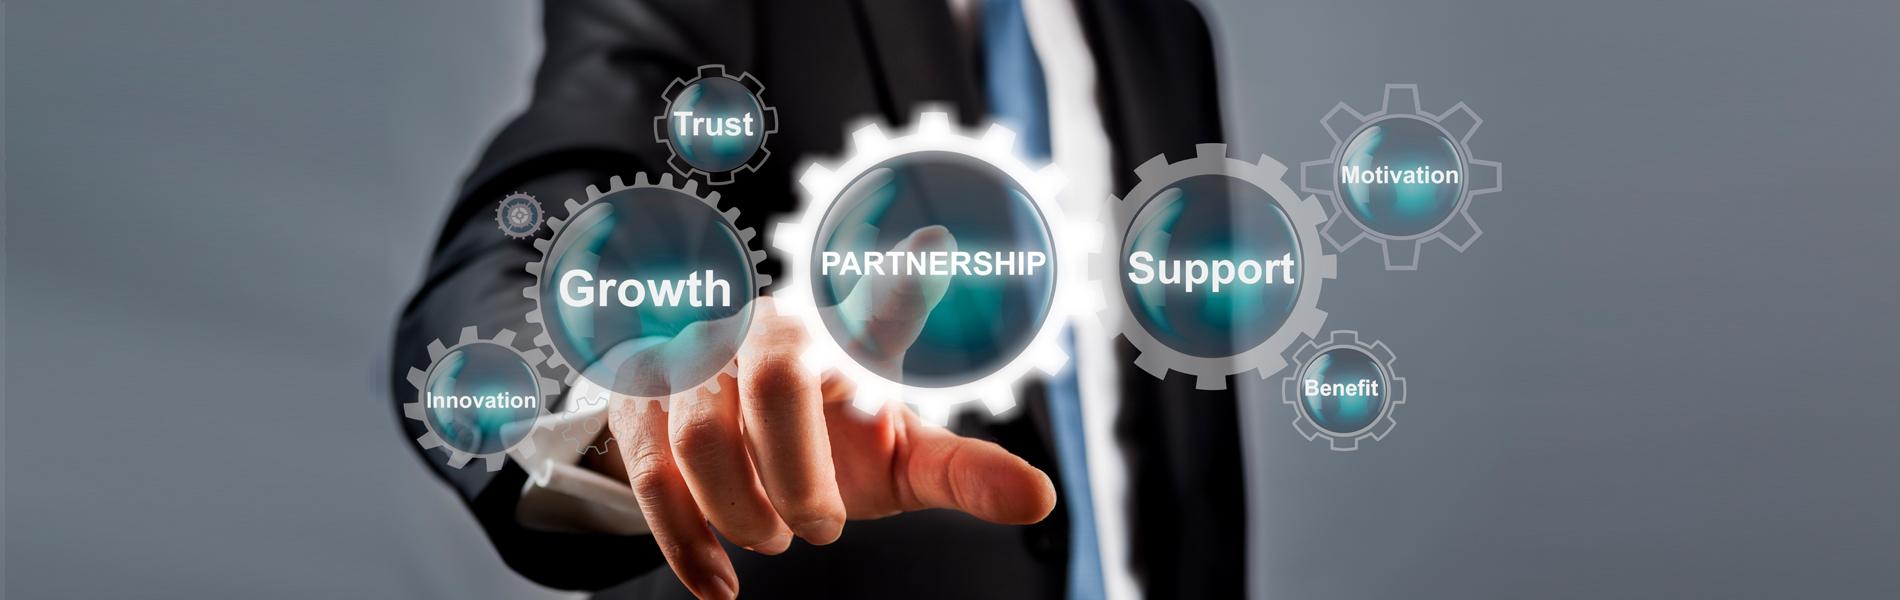 growthpartnershipsupport-banner2